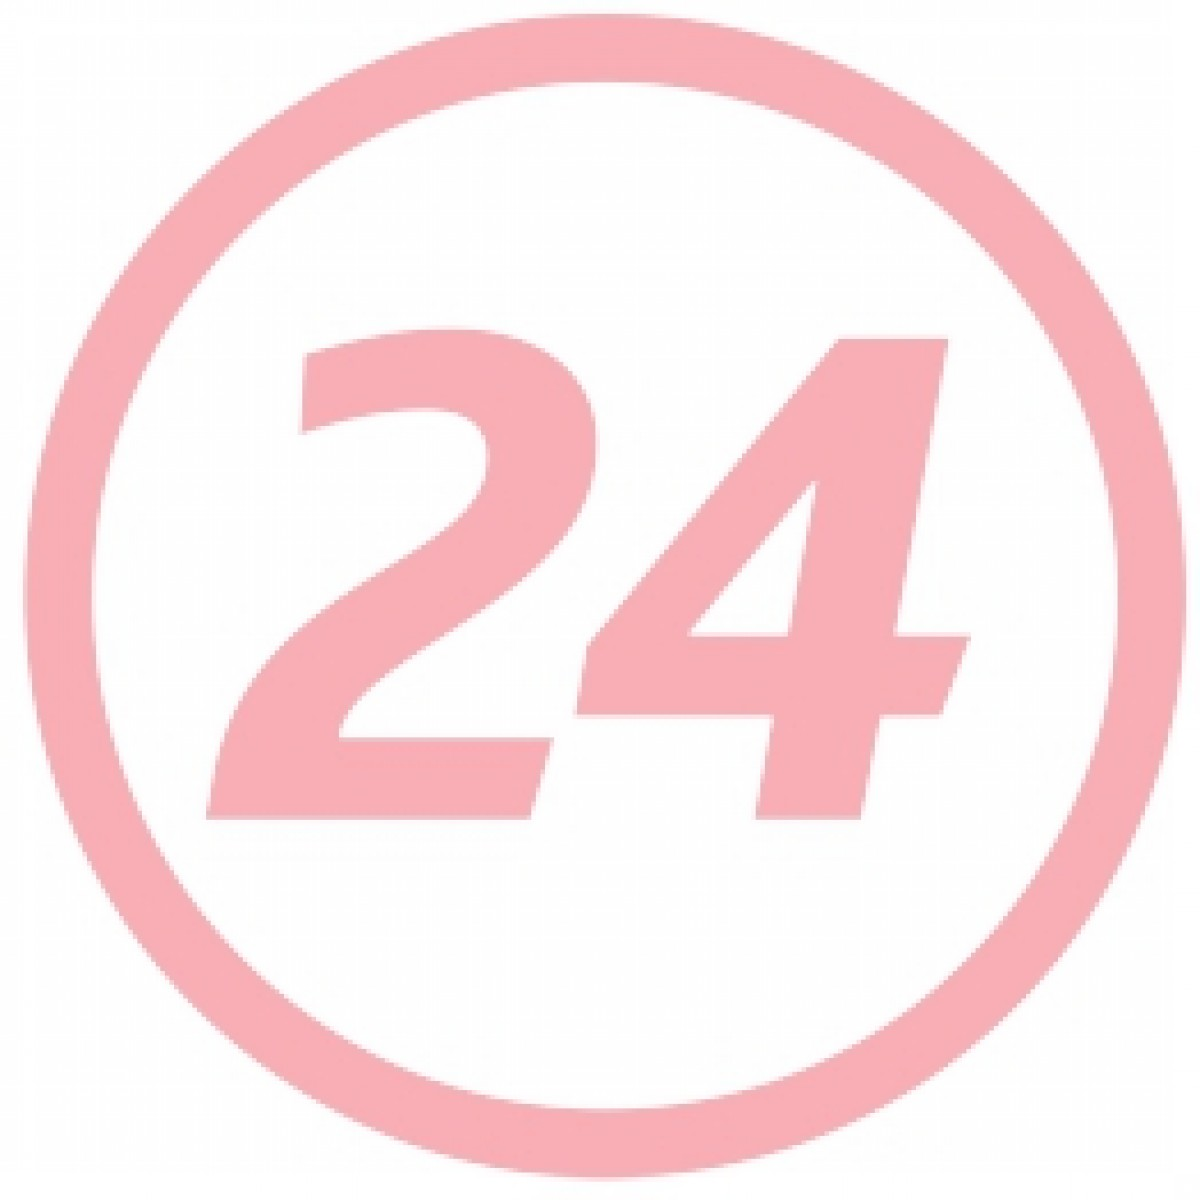 HARTMANN Peha-Crepp Fasa Elastica Pentru Fixare Pansamentelor 6cm x 4m, Fasa, 1buc